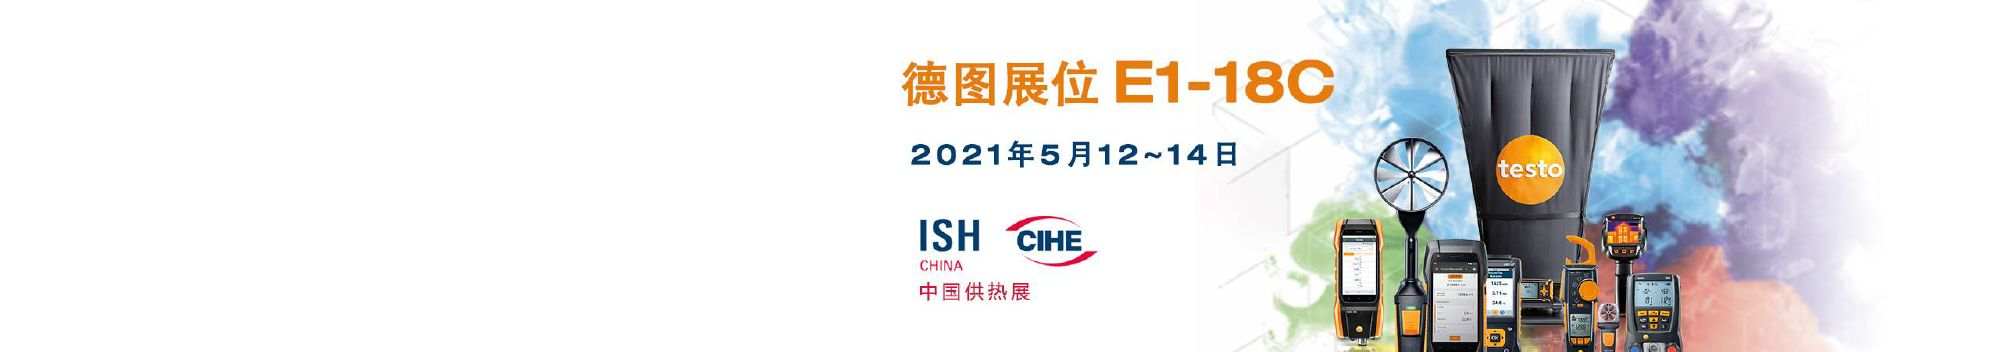 ISH China 2021 供熱展 </br><b>德圖展位 E1-18C</b> </br>歡迎您的蒞臨